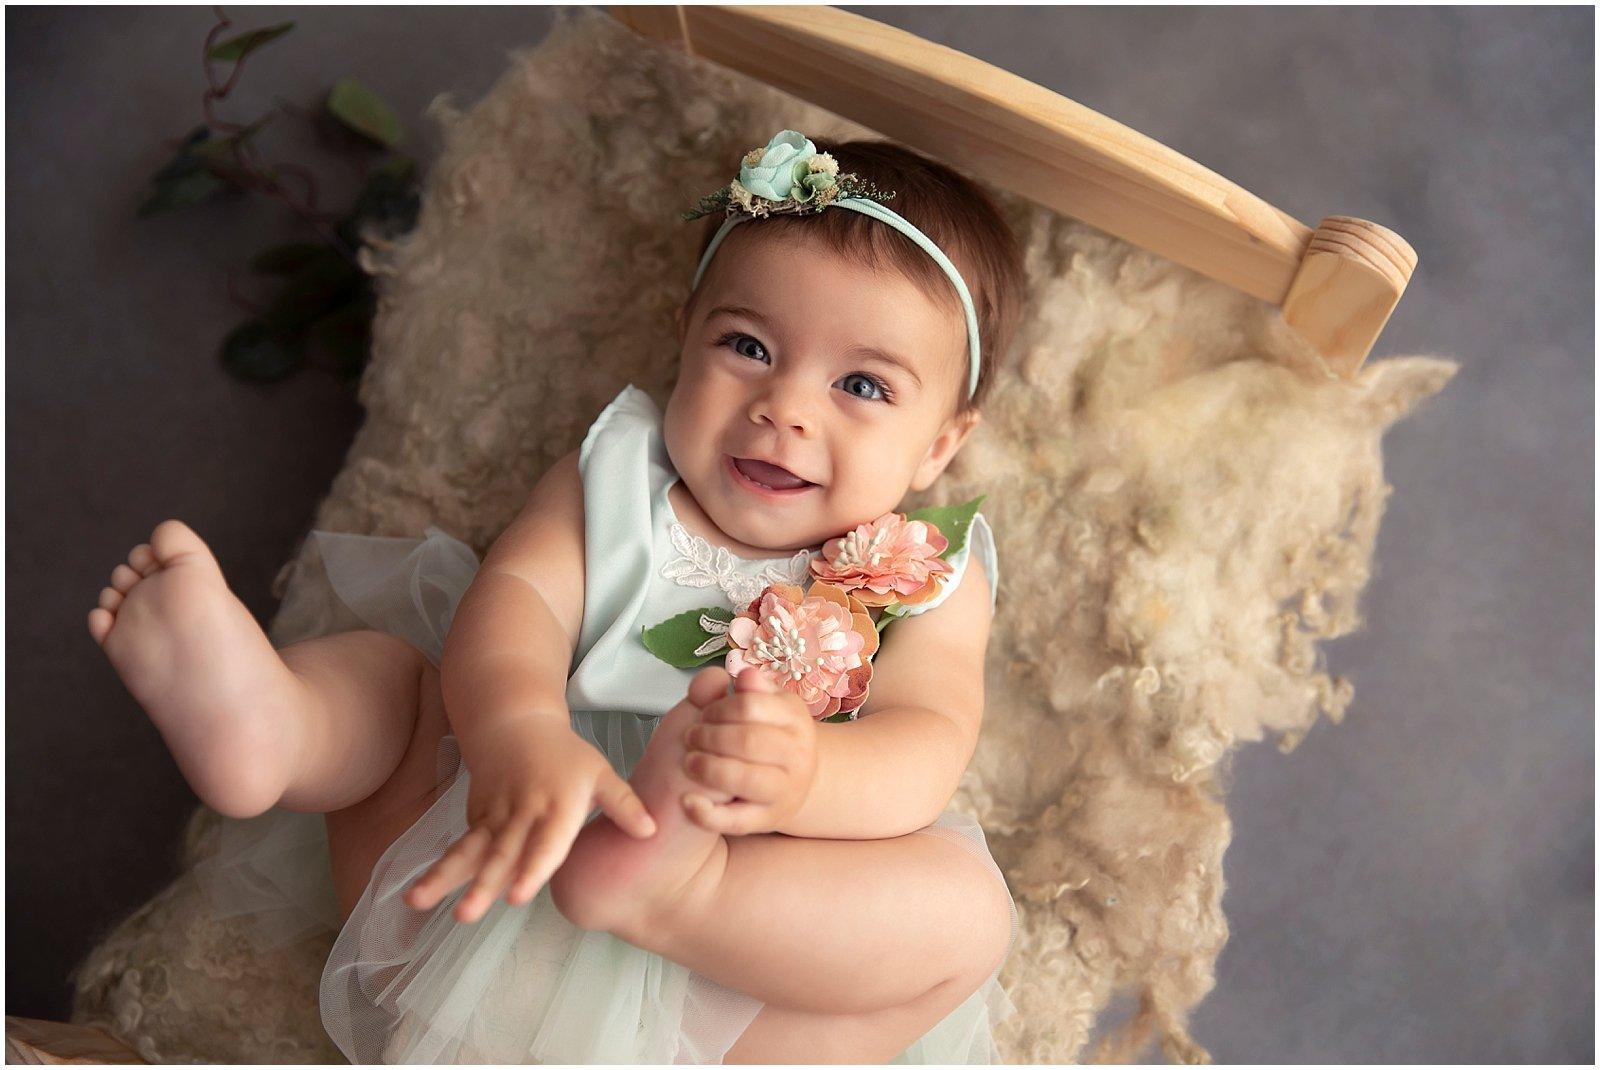 baby photography bay area ca